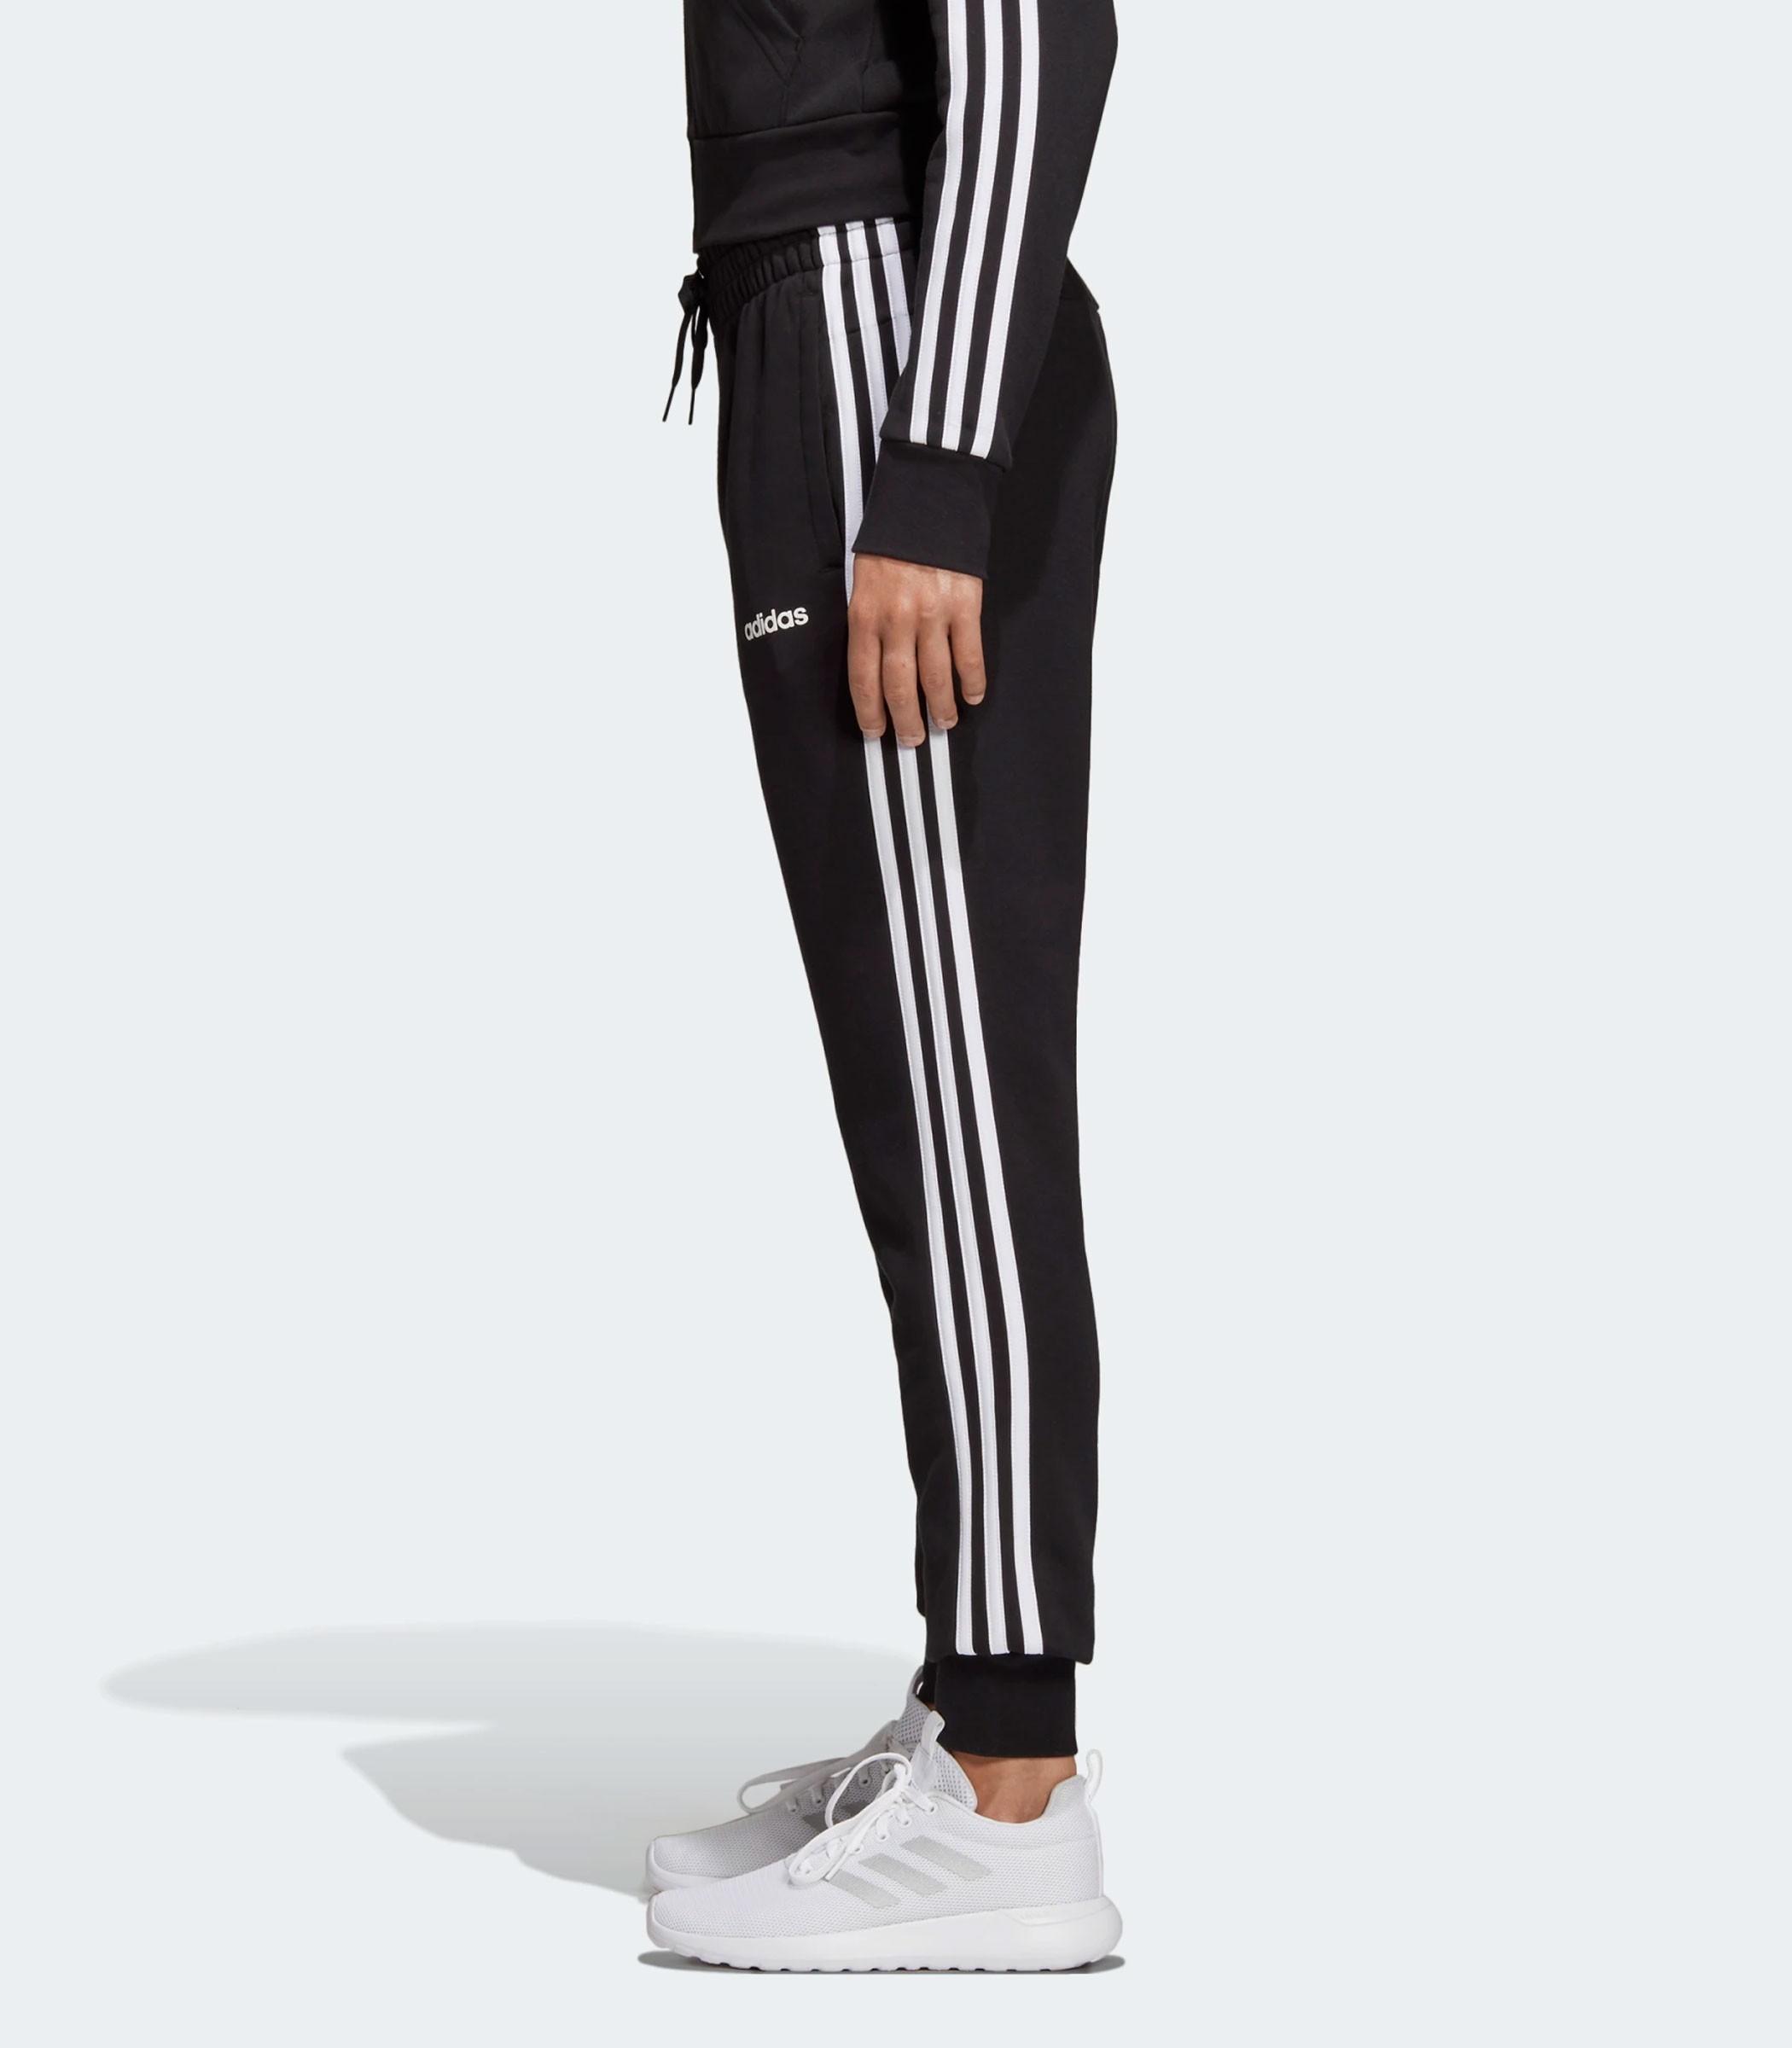 adidas donna abbigliamento pantaloni